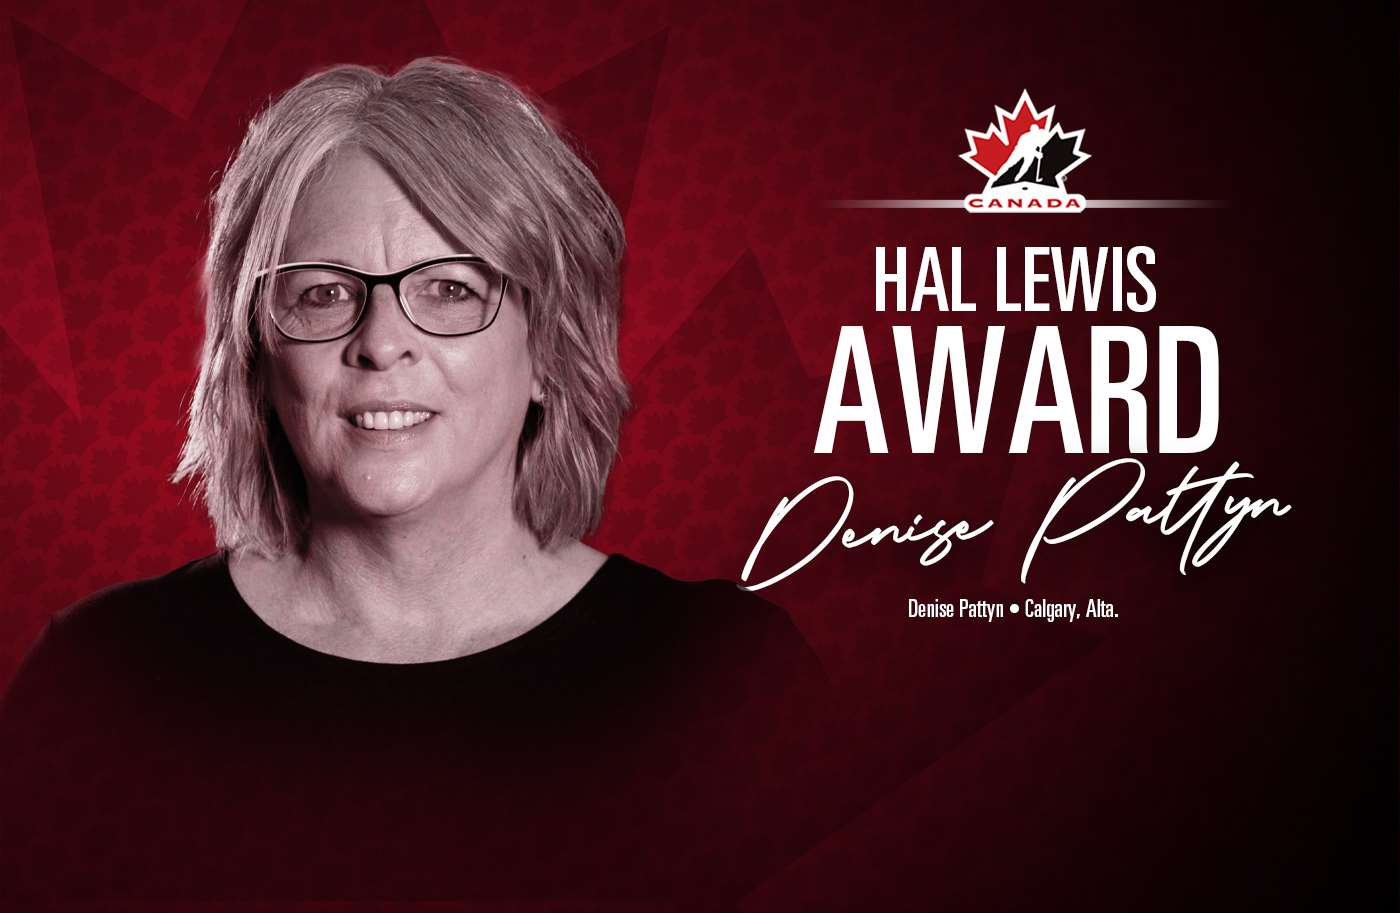 2021 hal lewis award staff denise pattyn 1400 e